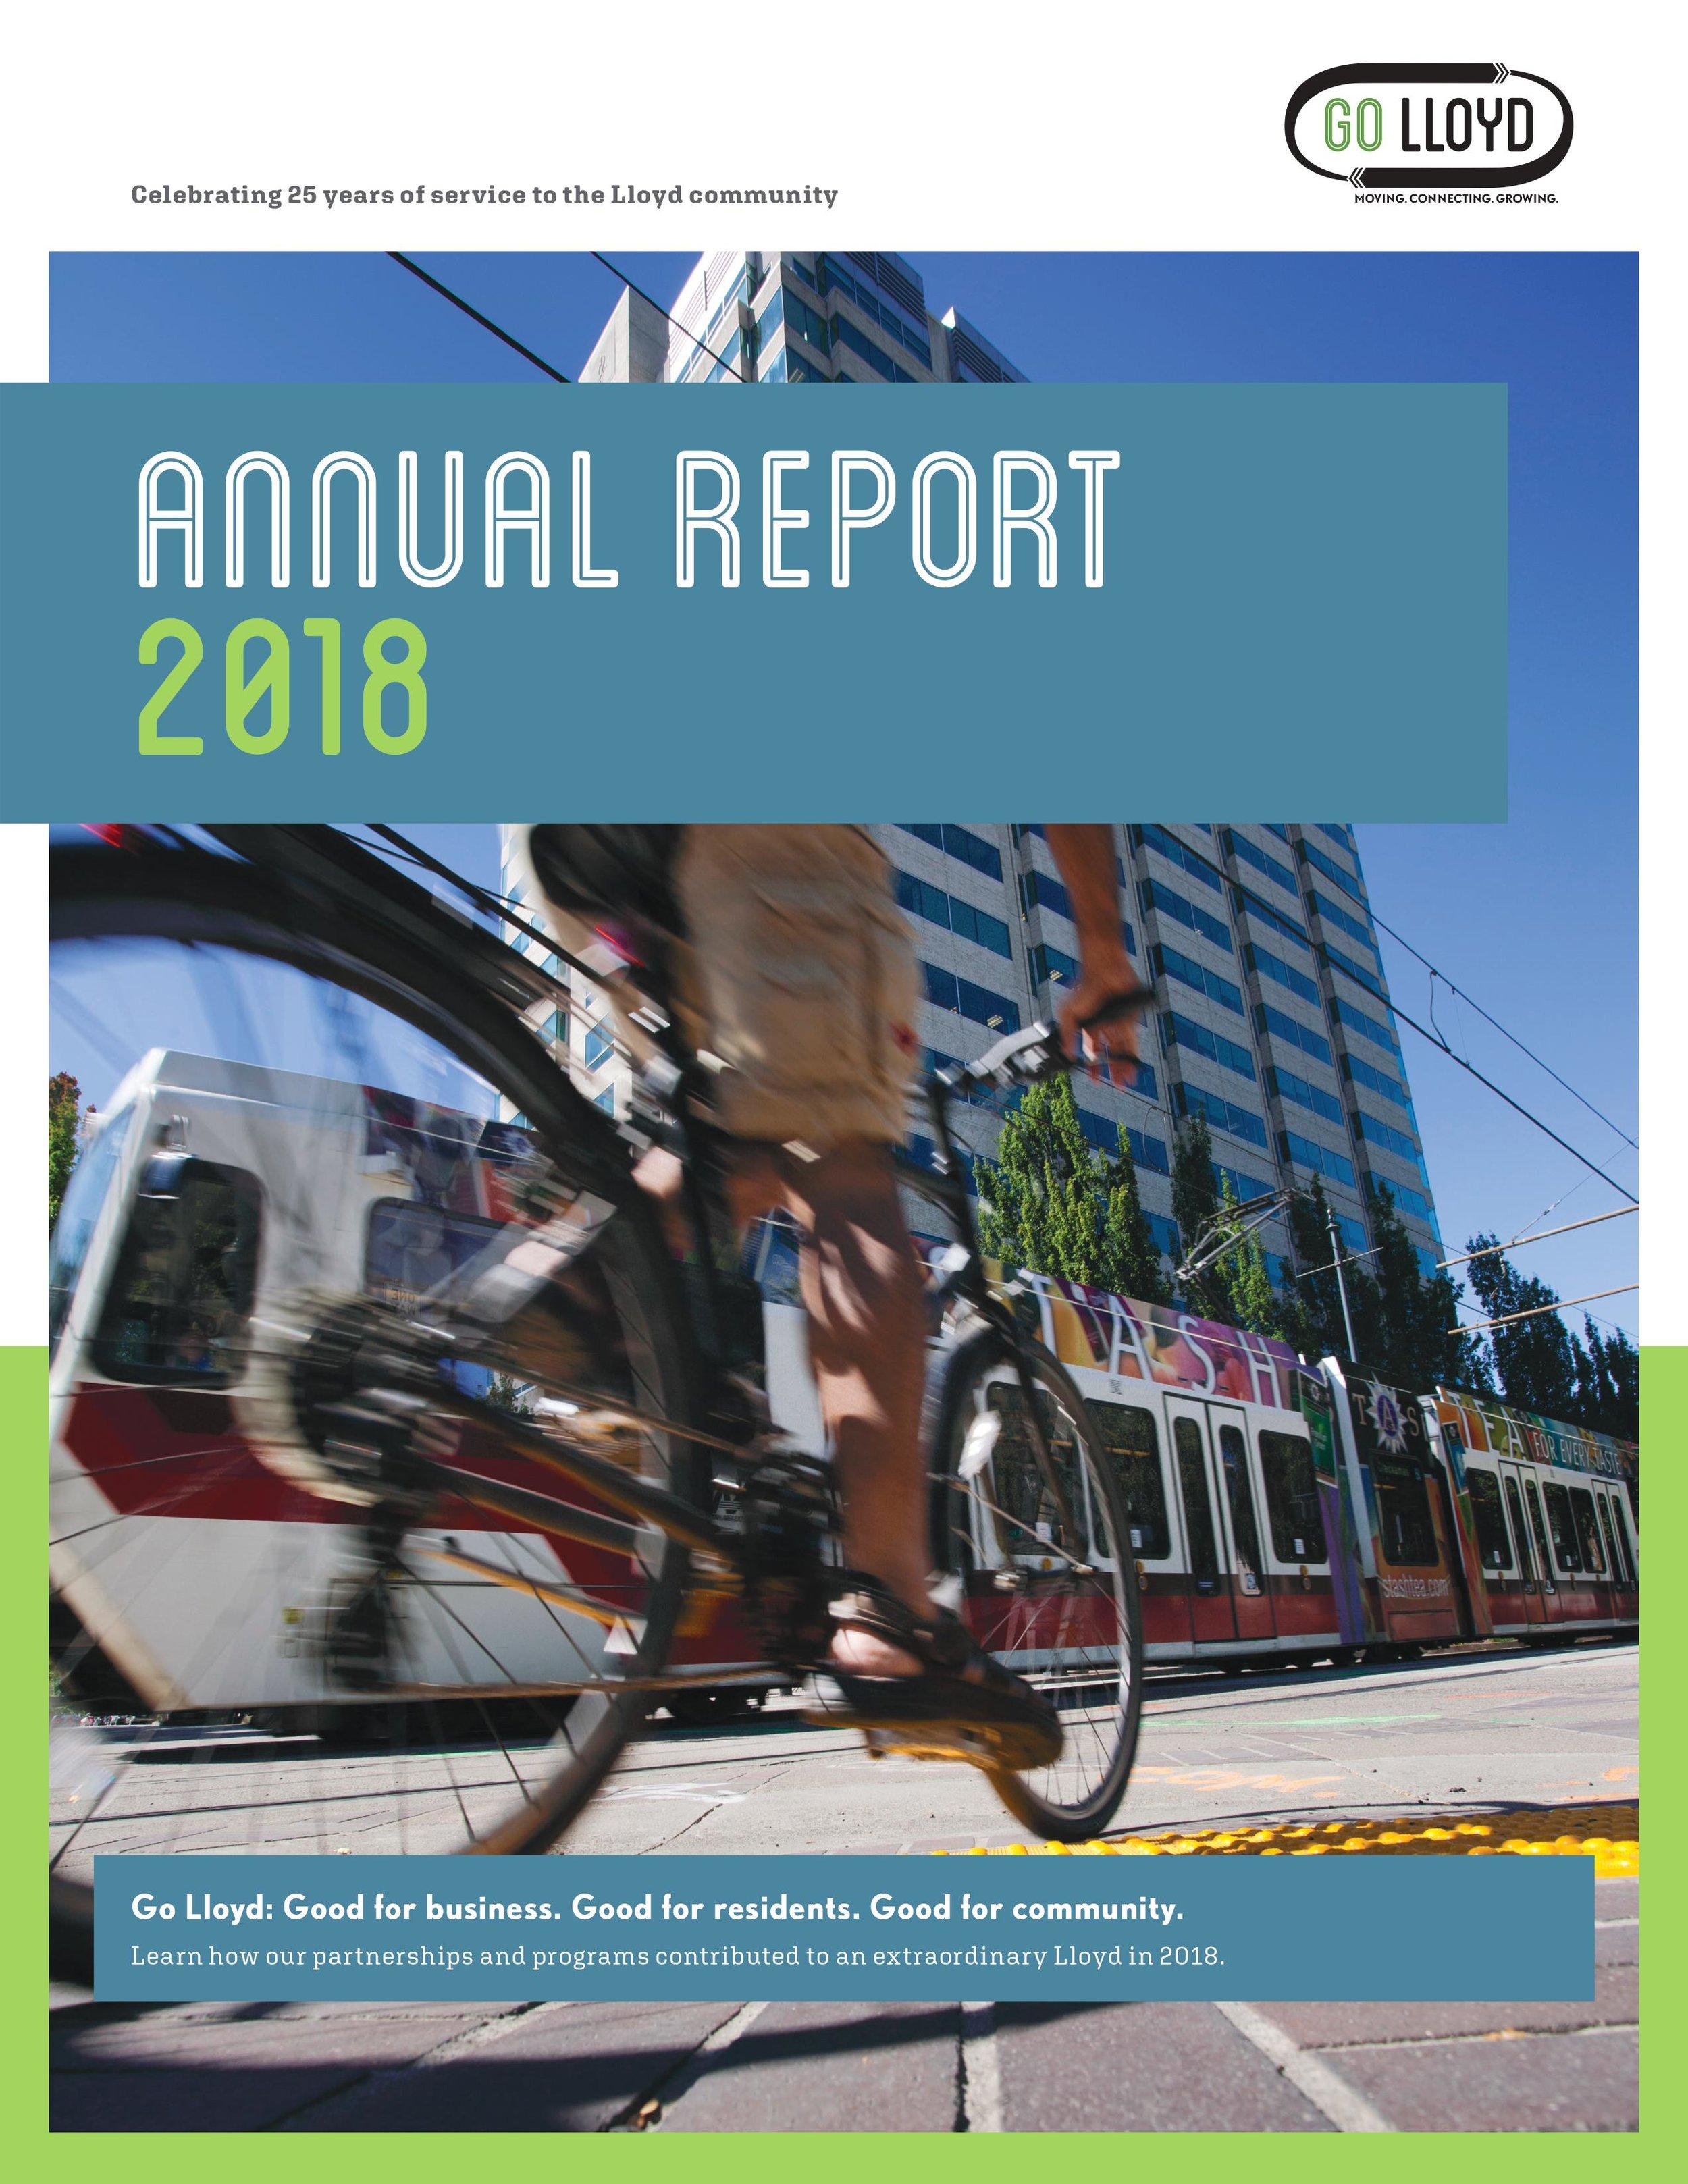 Go Lloyd 2018 Annual Report Cover.jpg